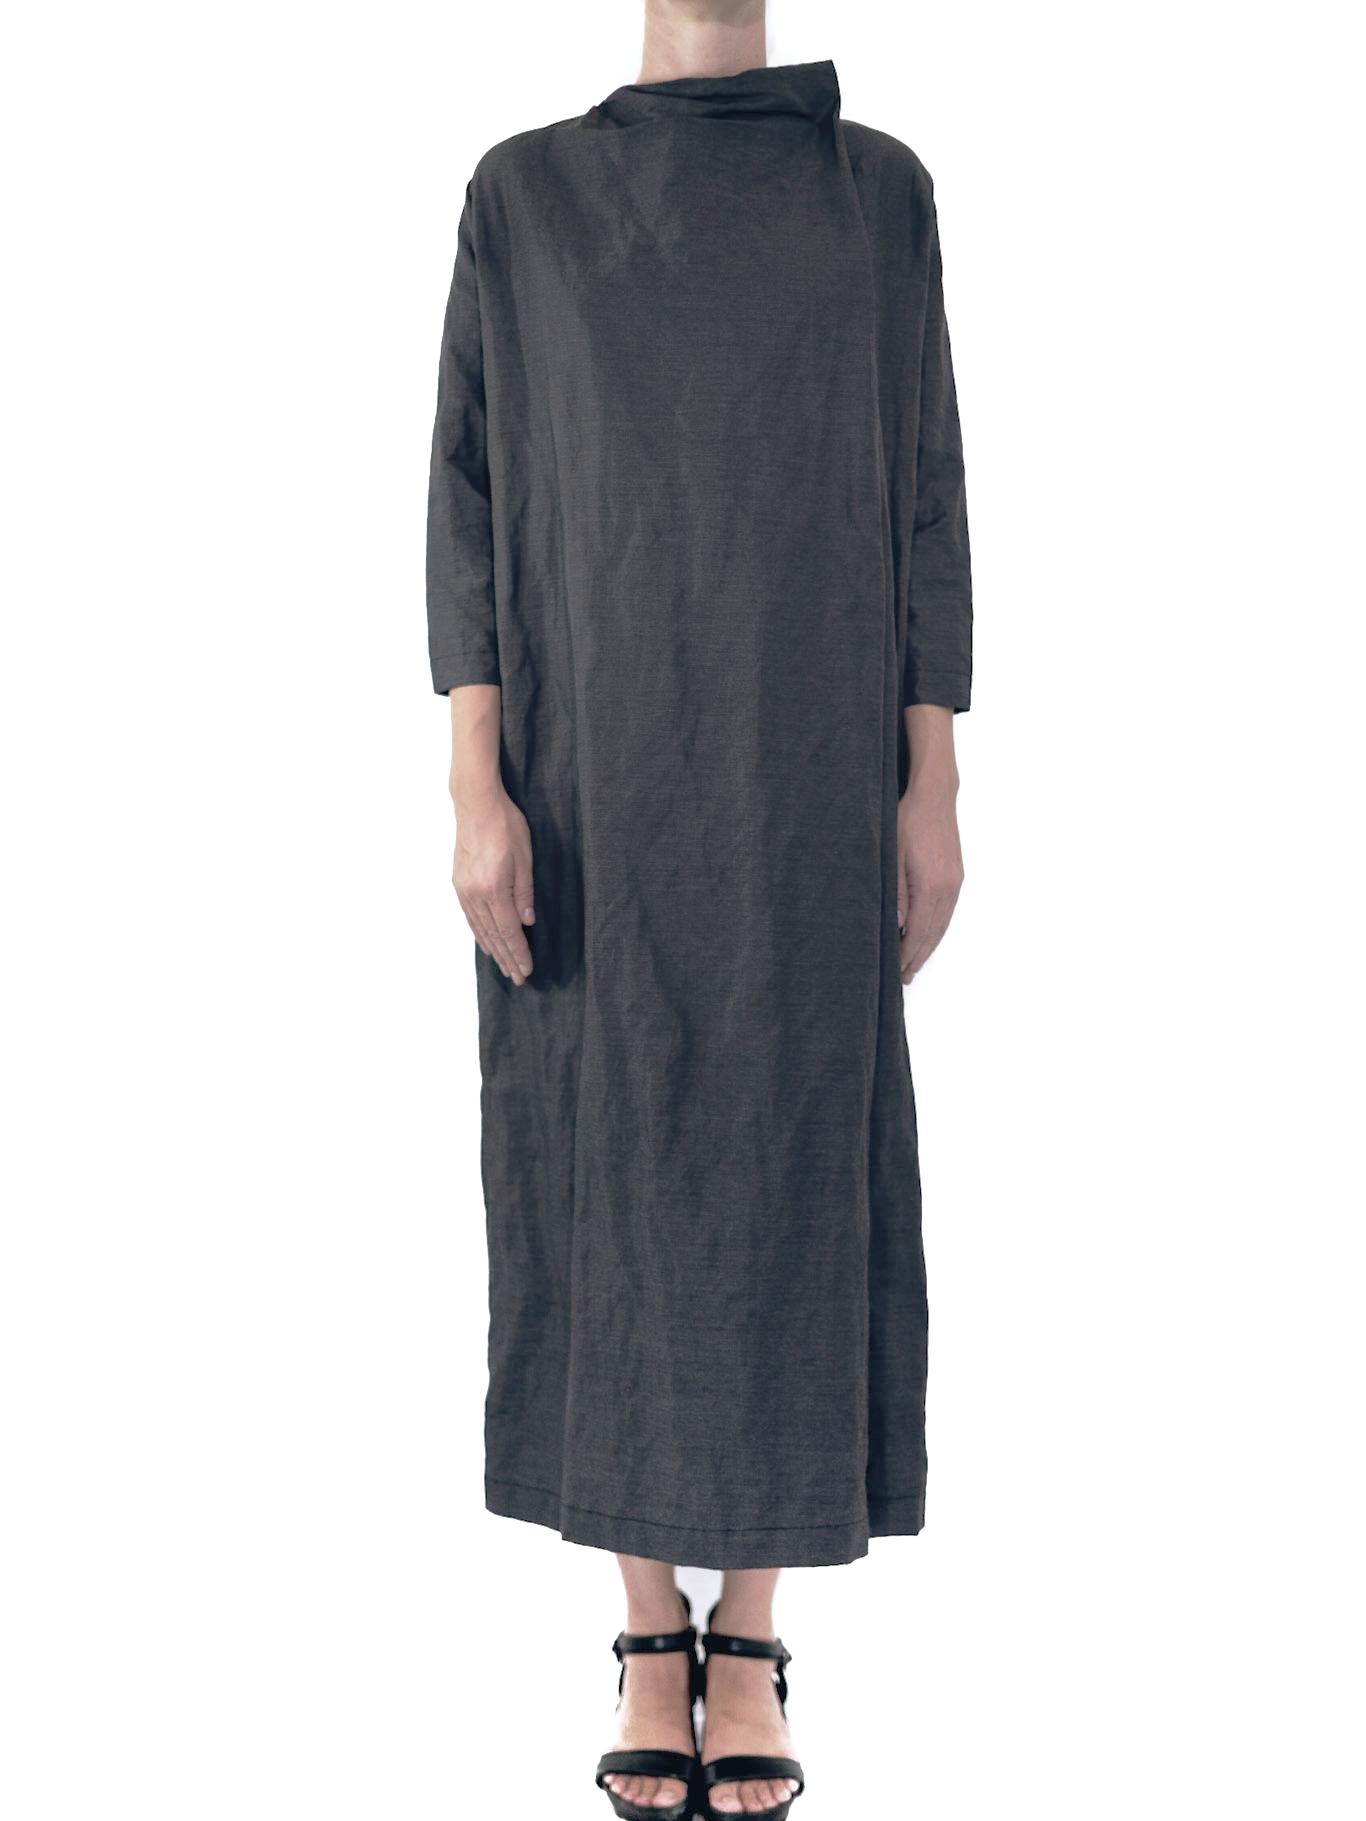 19.0.20 DG - DRESS : STRICT  FABRIC: 77% COTTON / 23% POLYESTER  SIZE: S / M / L  COLOR: GREY